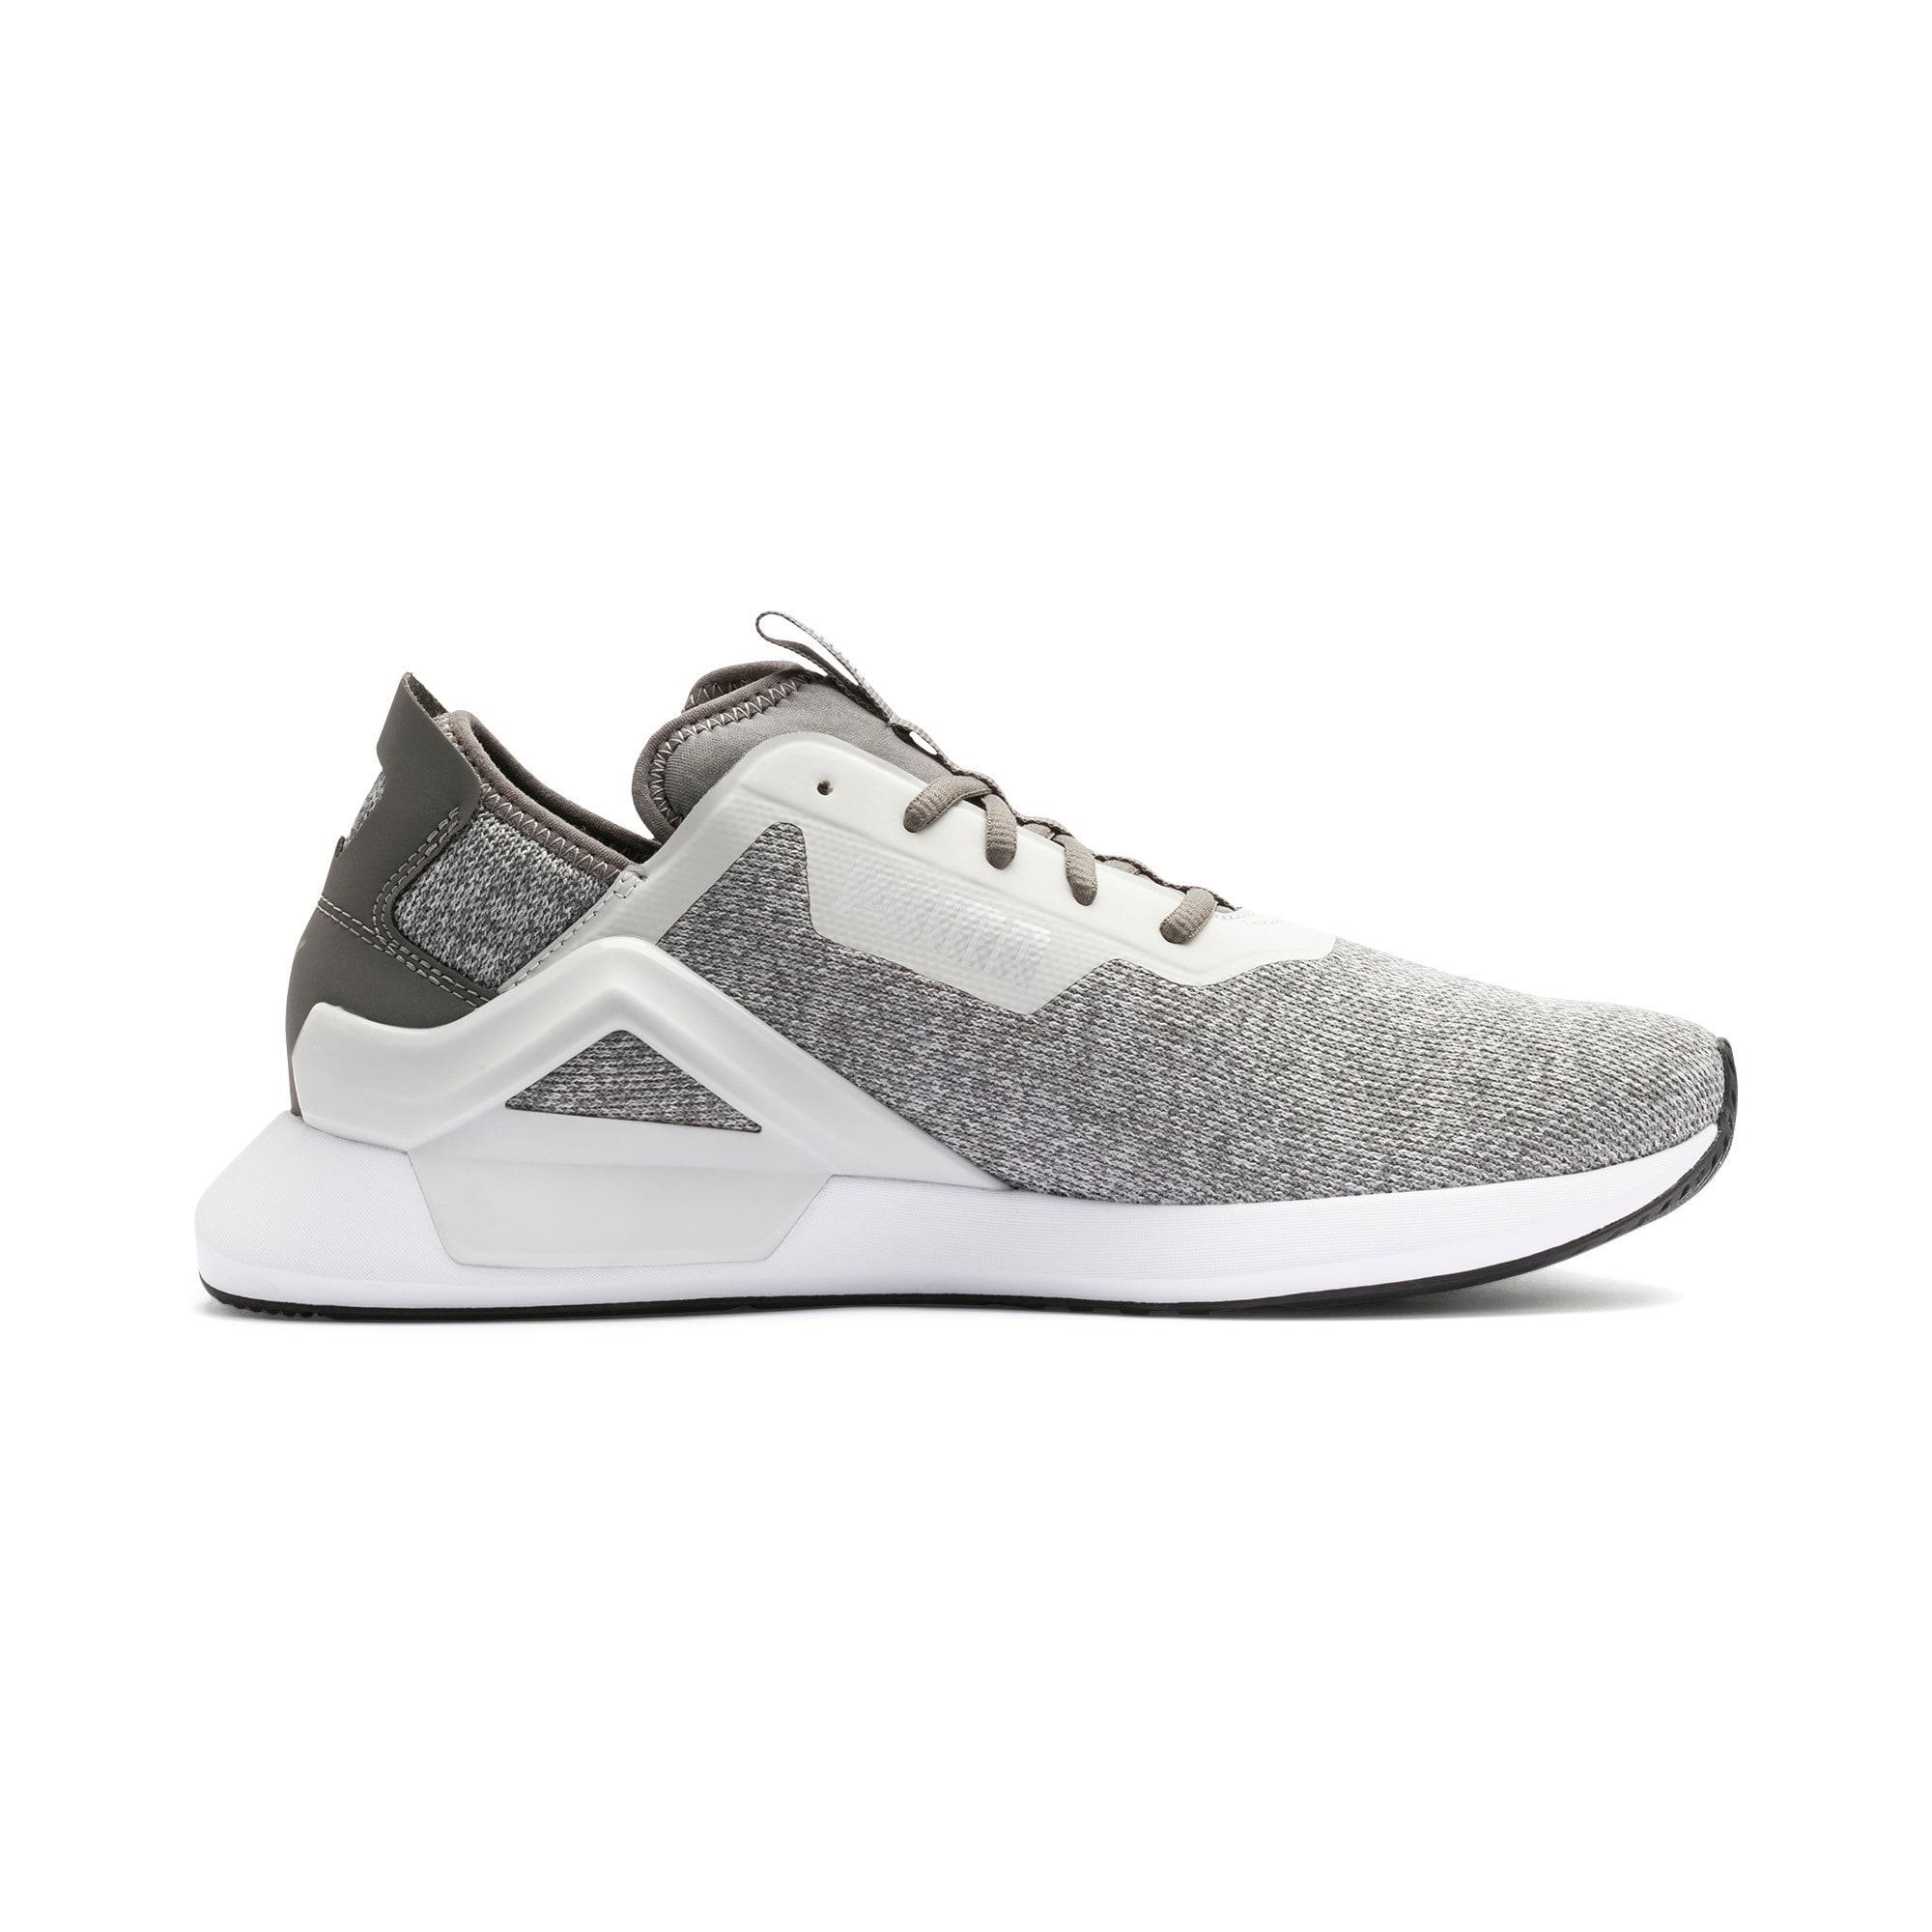 Thumbnail 6 of Rogue X Knit Herren Sneaker, CASTLEROCK-Glacier Gray, medium